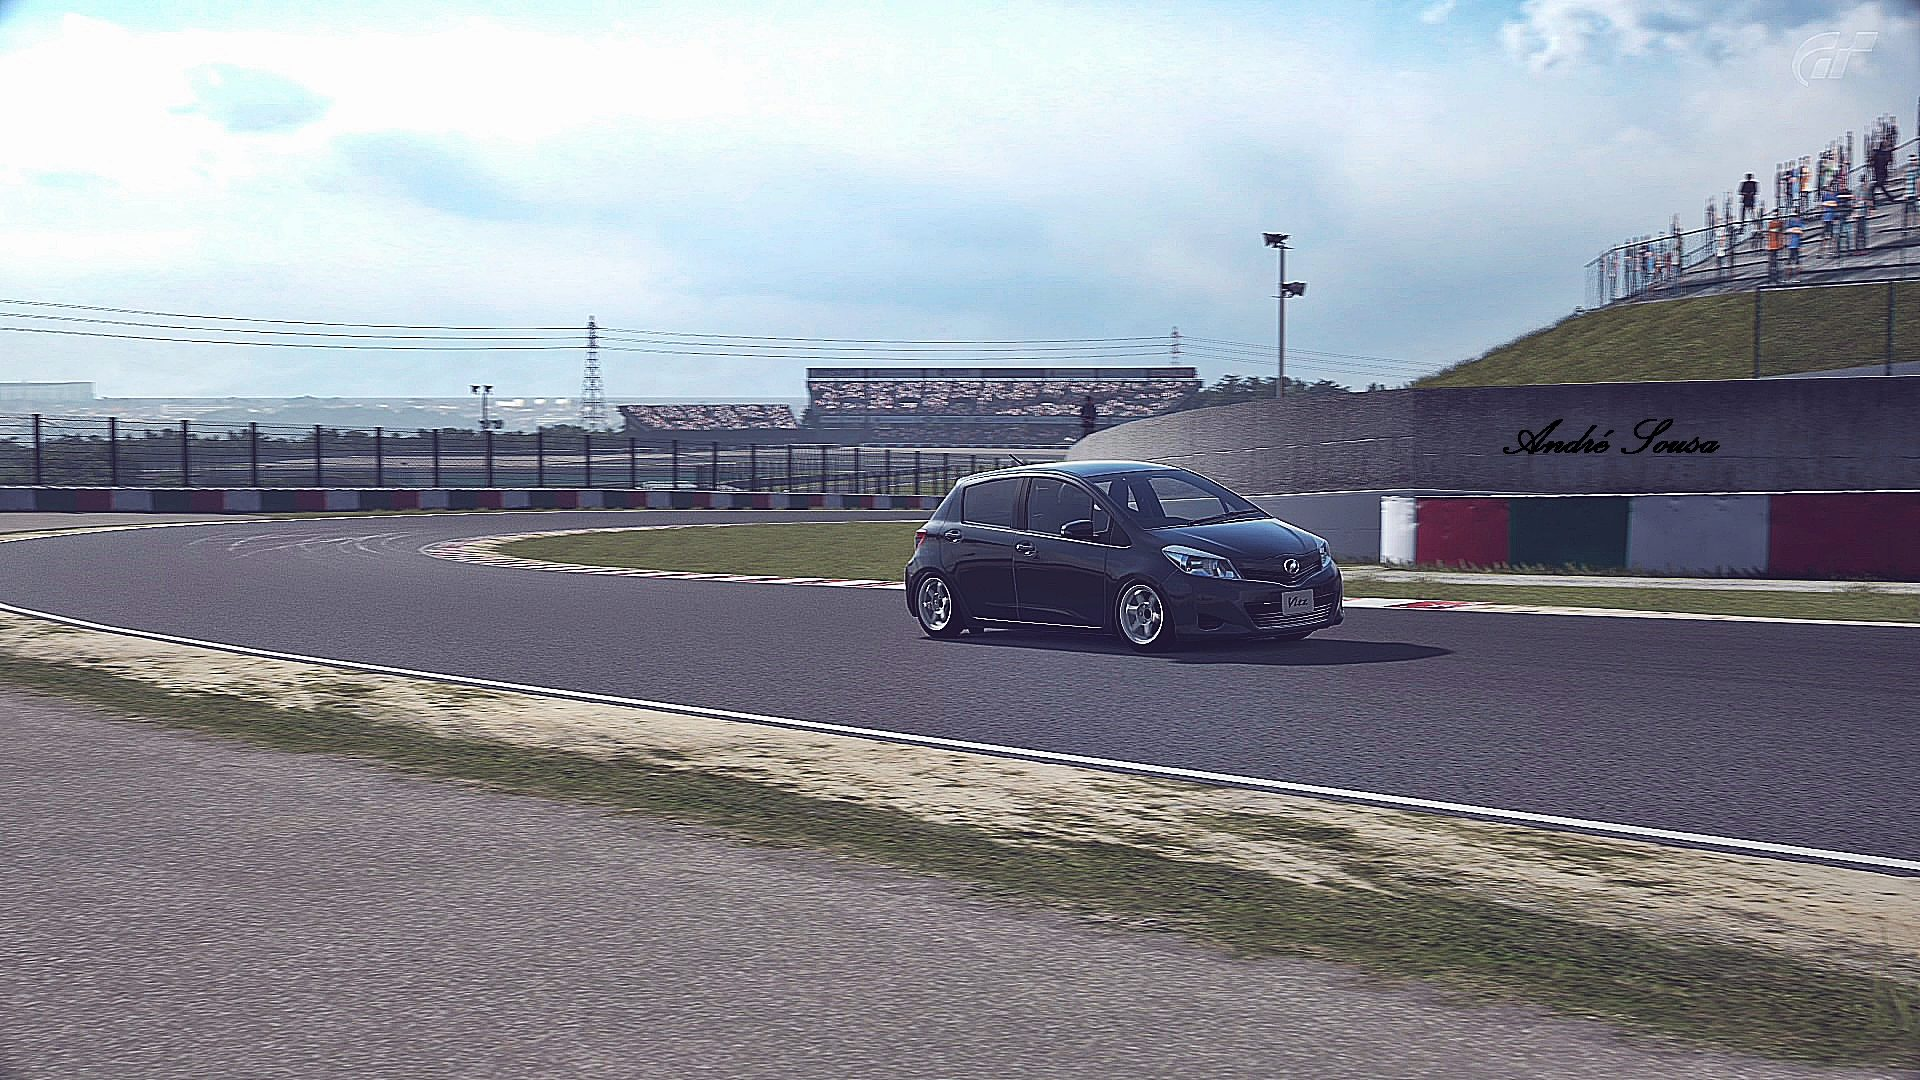 Suzuka Circuit - Percurso Este_3.jpg